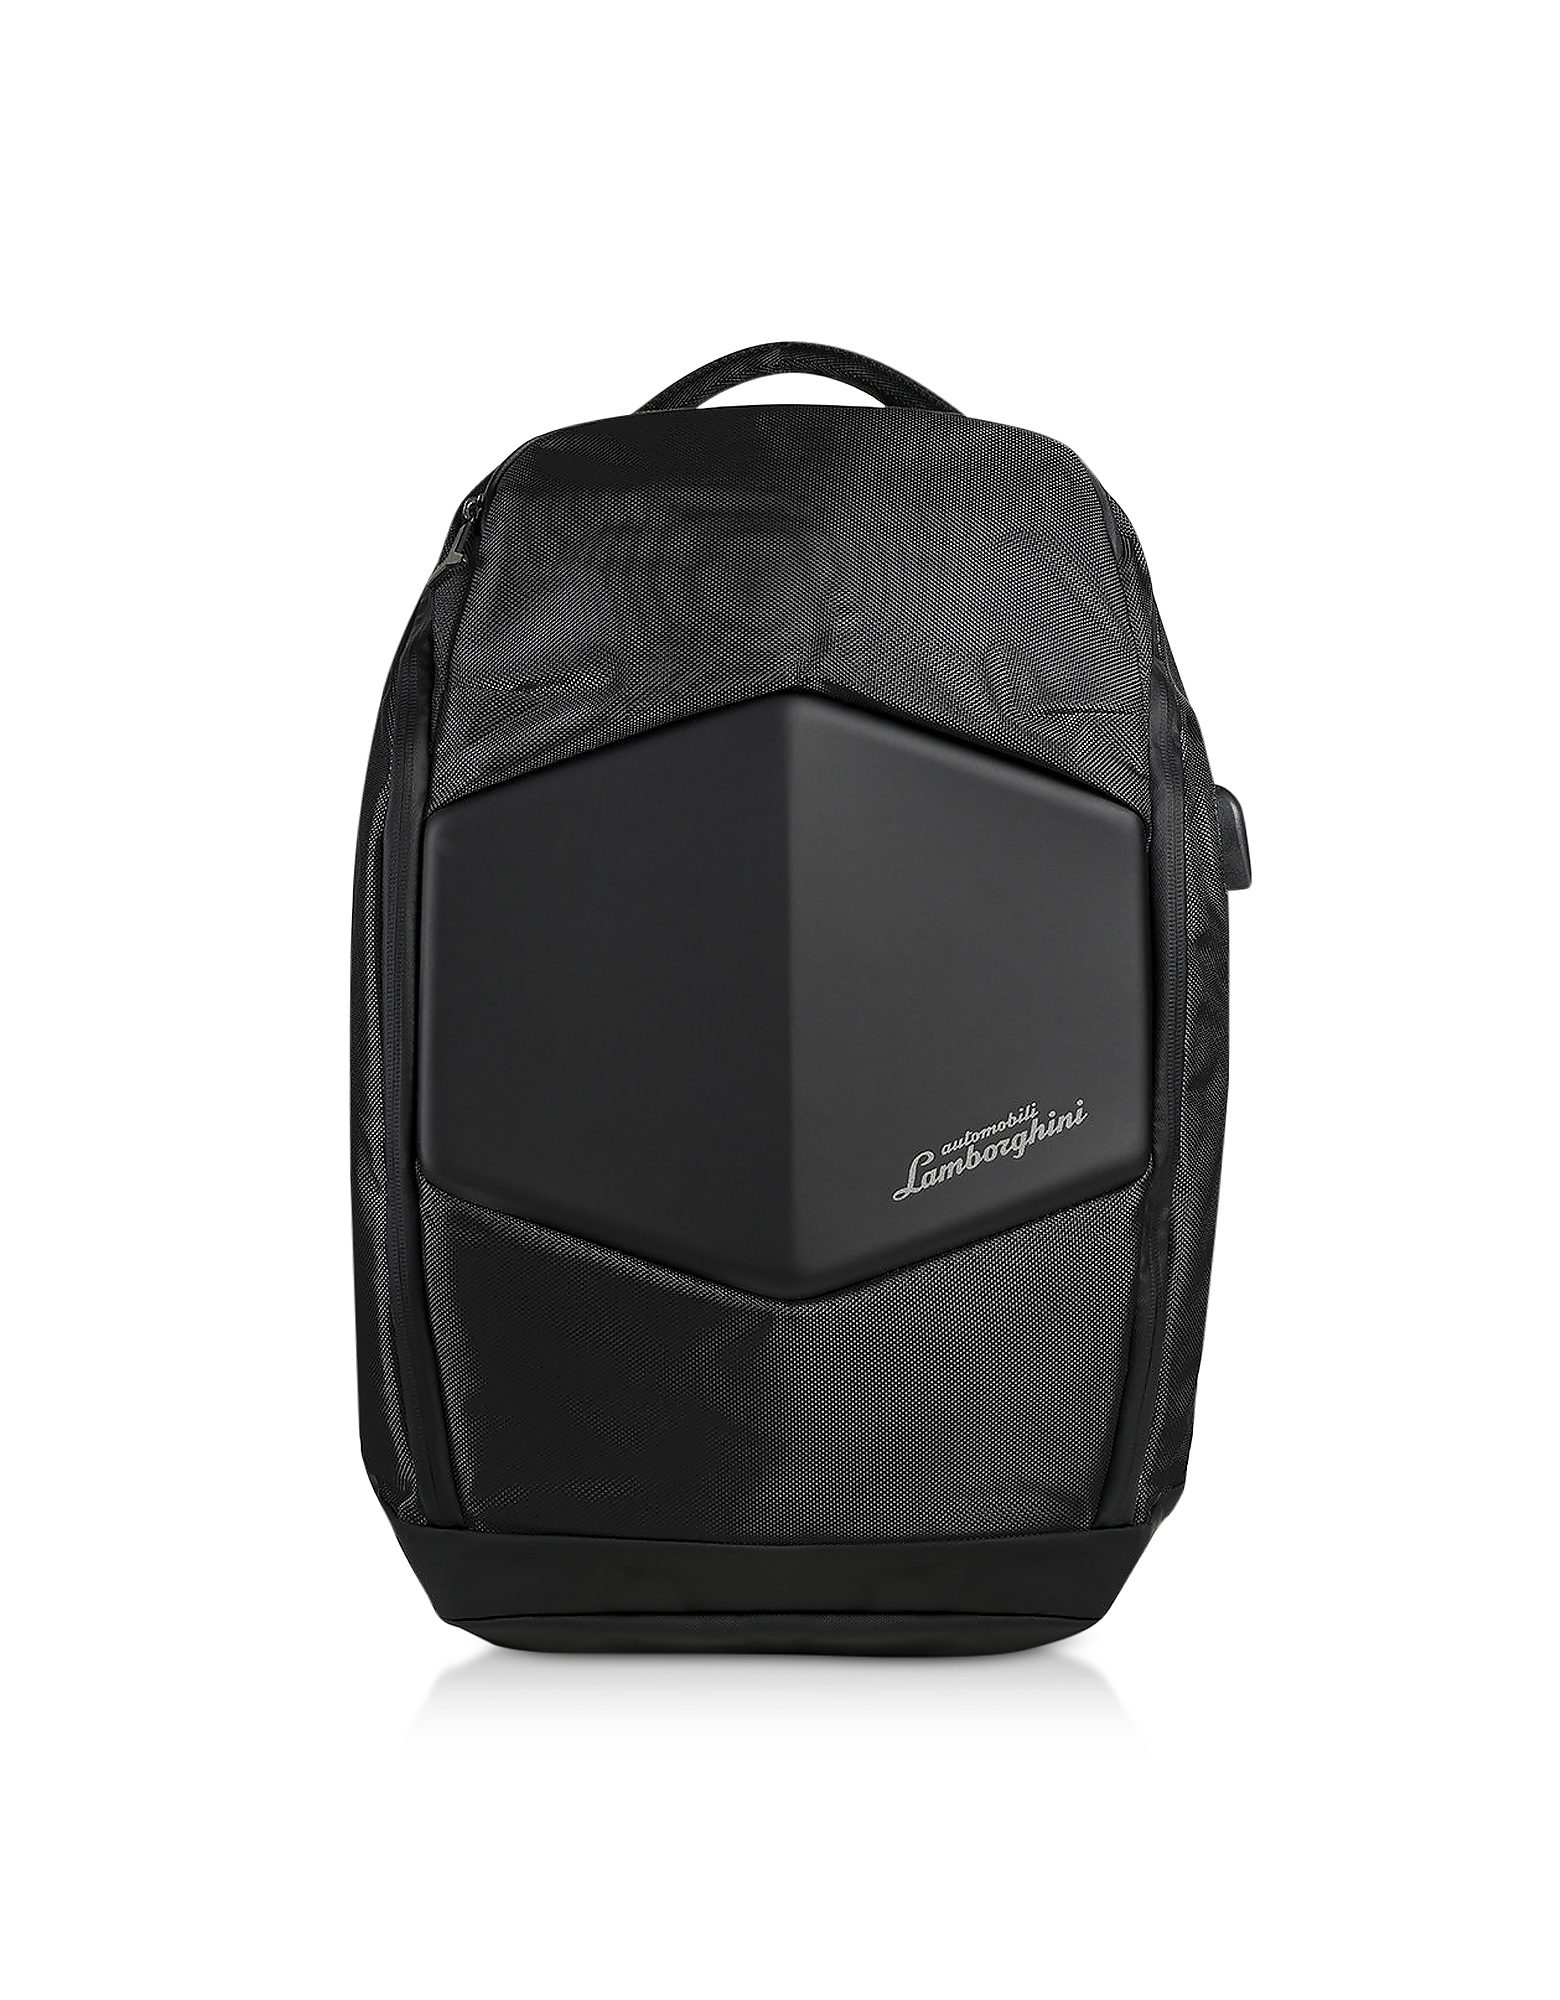 Lamborghini Automobili Designer Men's Bags, Galleria LBZA00107T Hard Shell Backpack